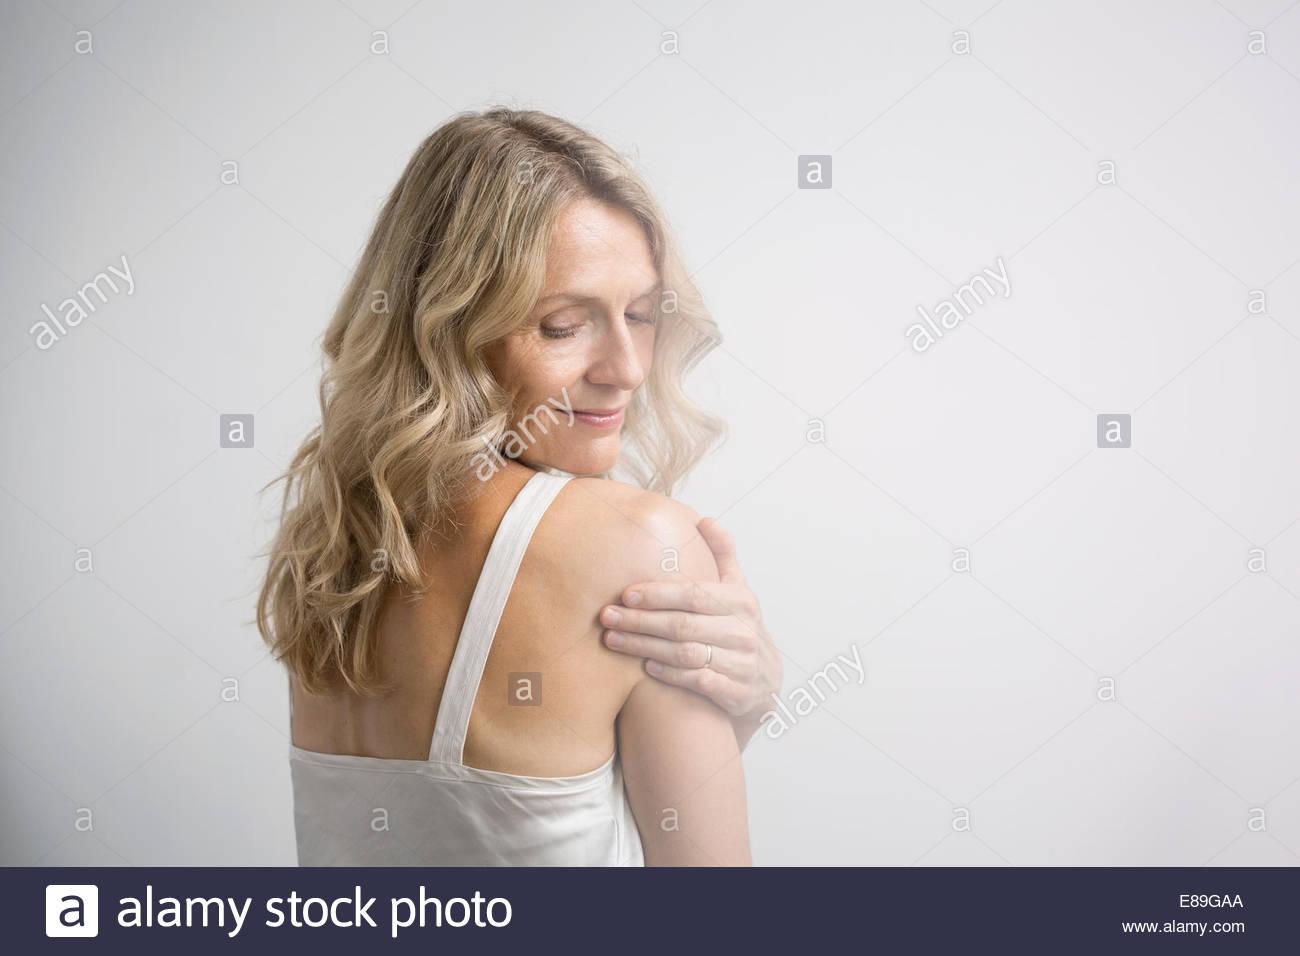 Blonde woman touching shoulder - Stock Image